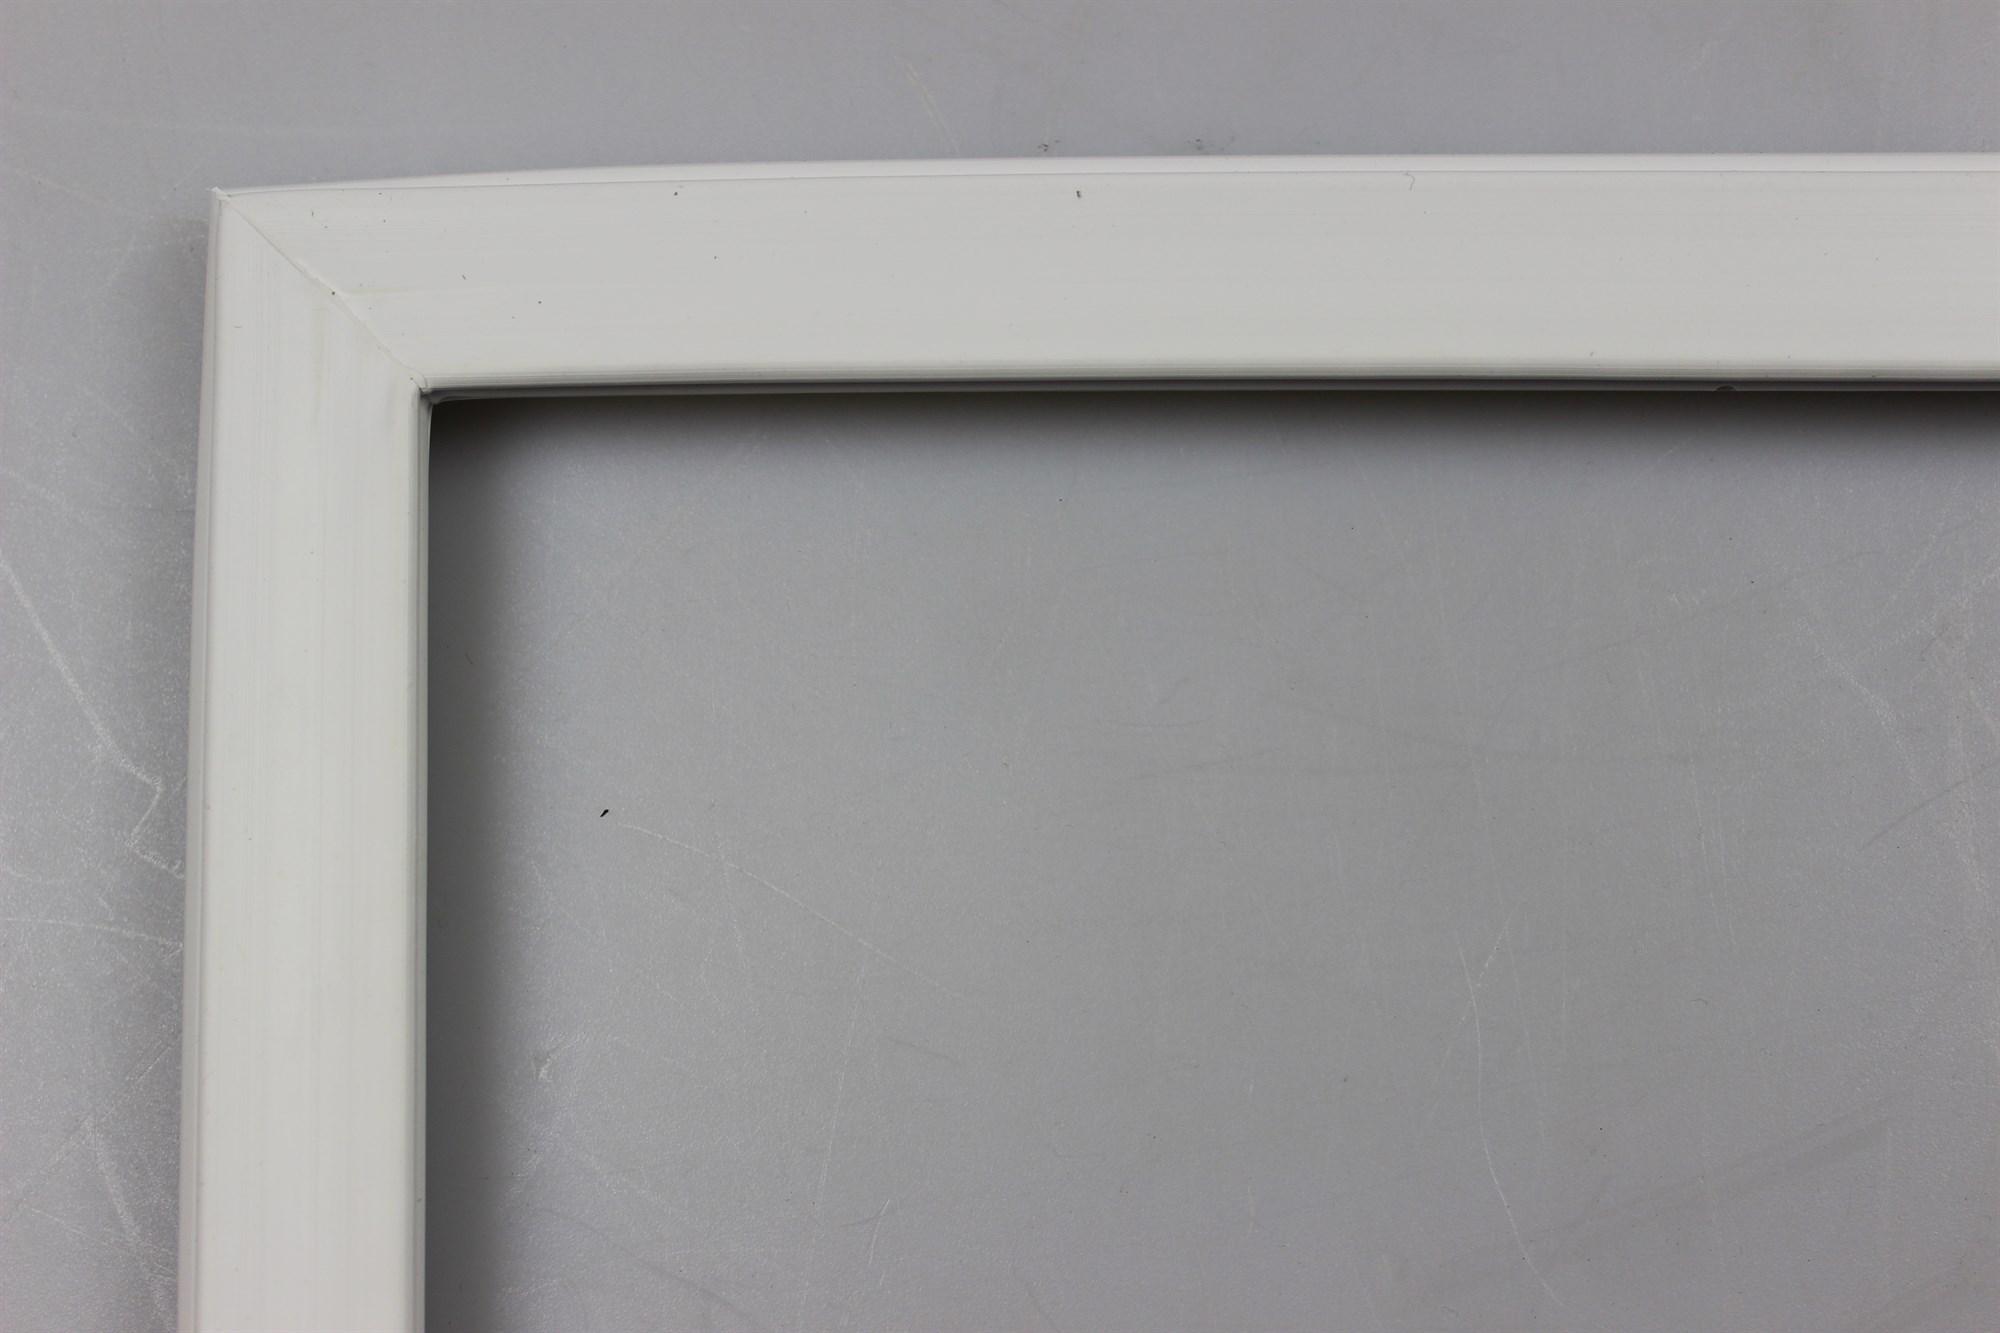 Siemens Kühlschrank Dichtung : Kühlschrankdichtung siemens kühl gefrierschrank